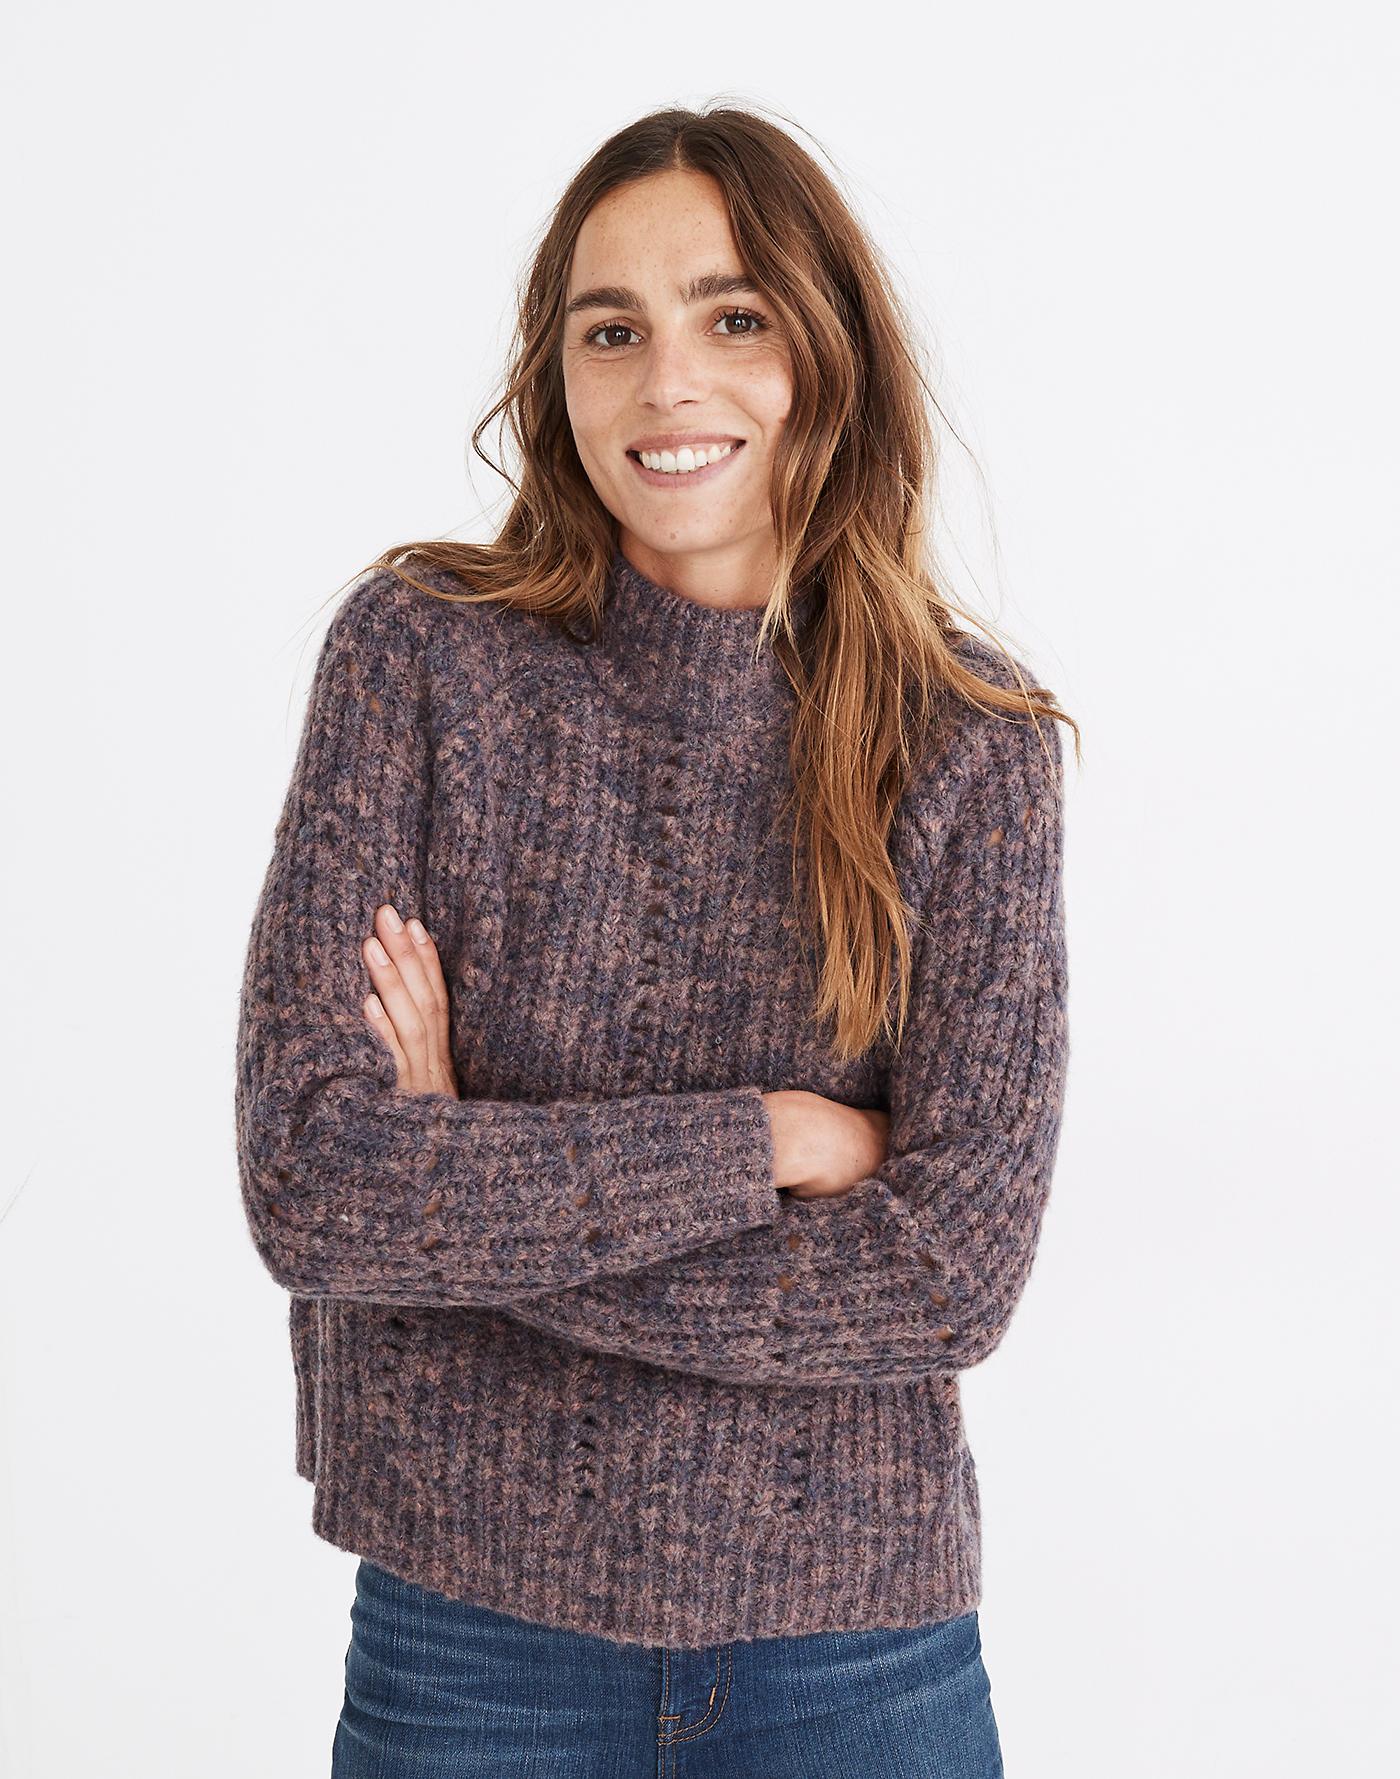 Pointelle Mockneck Pullover Sweater MEDIA